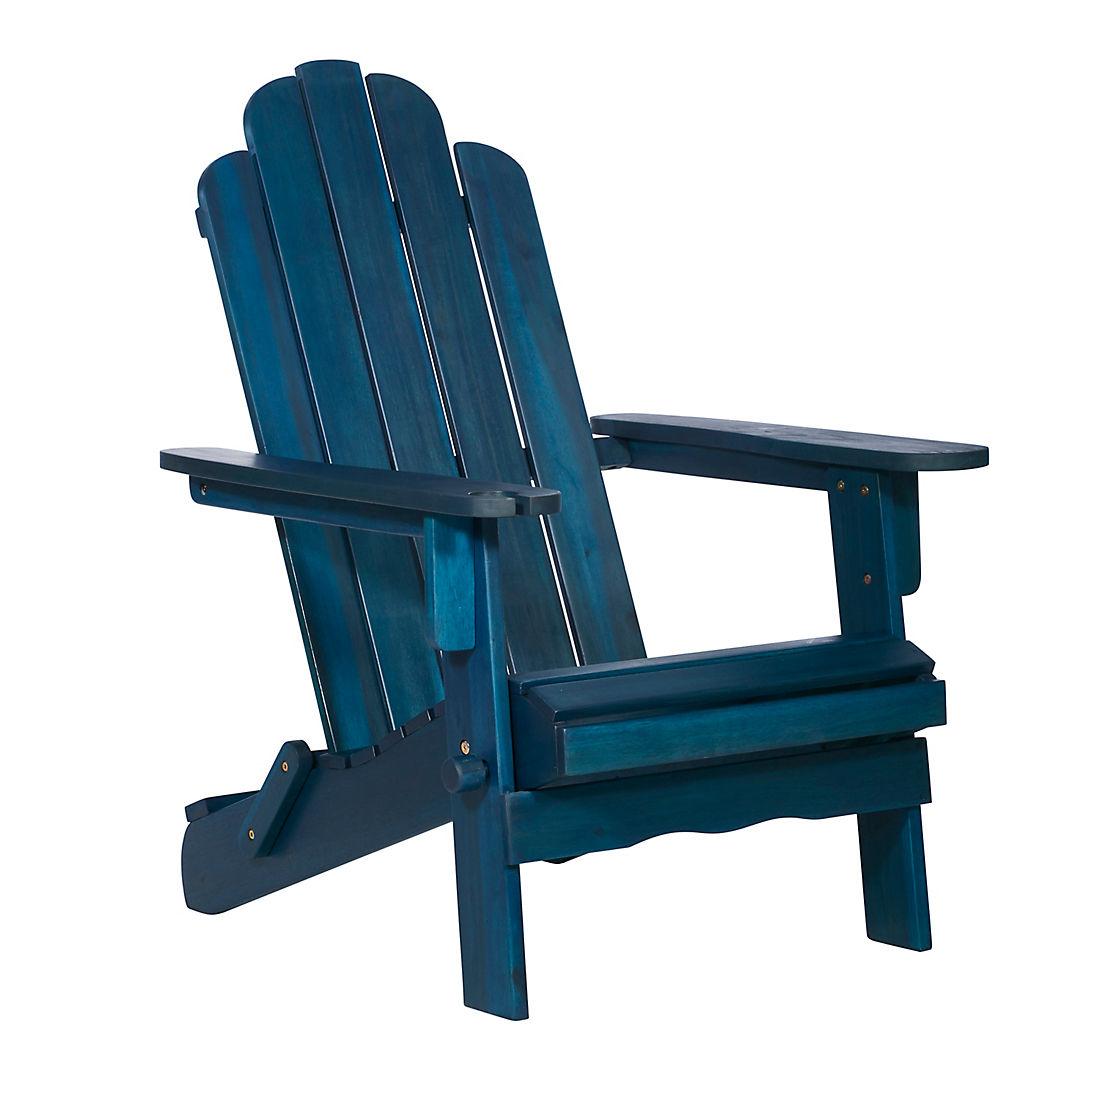 Surprising W Trends Outdoor Acacia Wood Folding Adirondack Chair Lamtechconsult Wood Chair Design Ideas Lamtechconsultcom